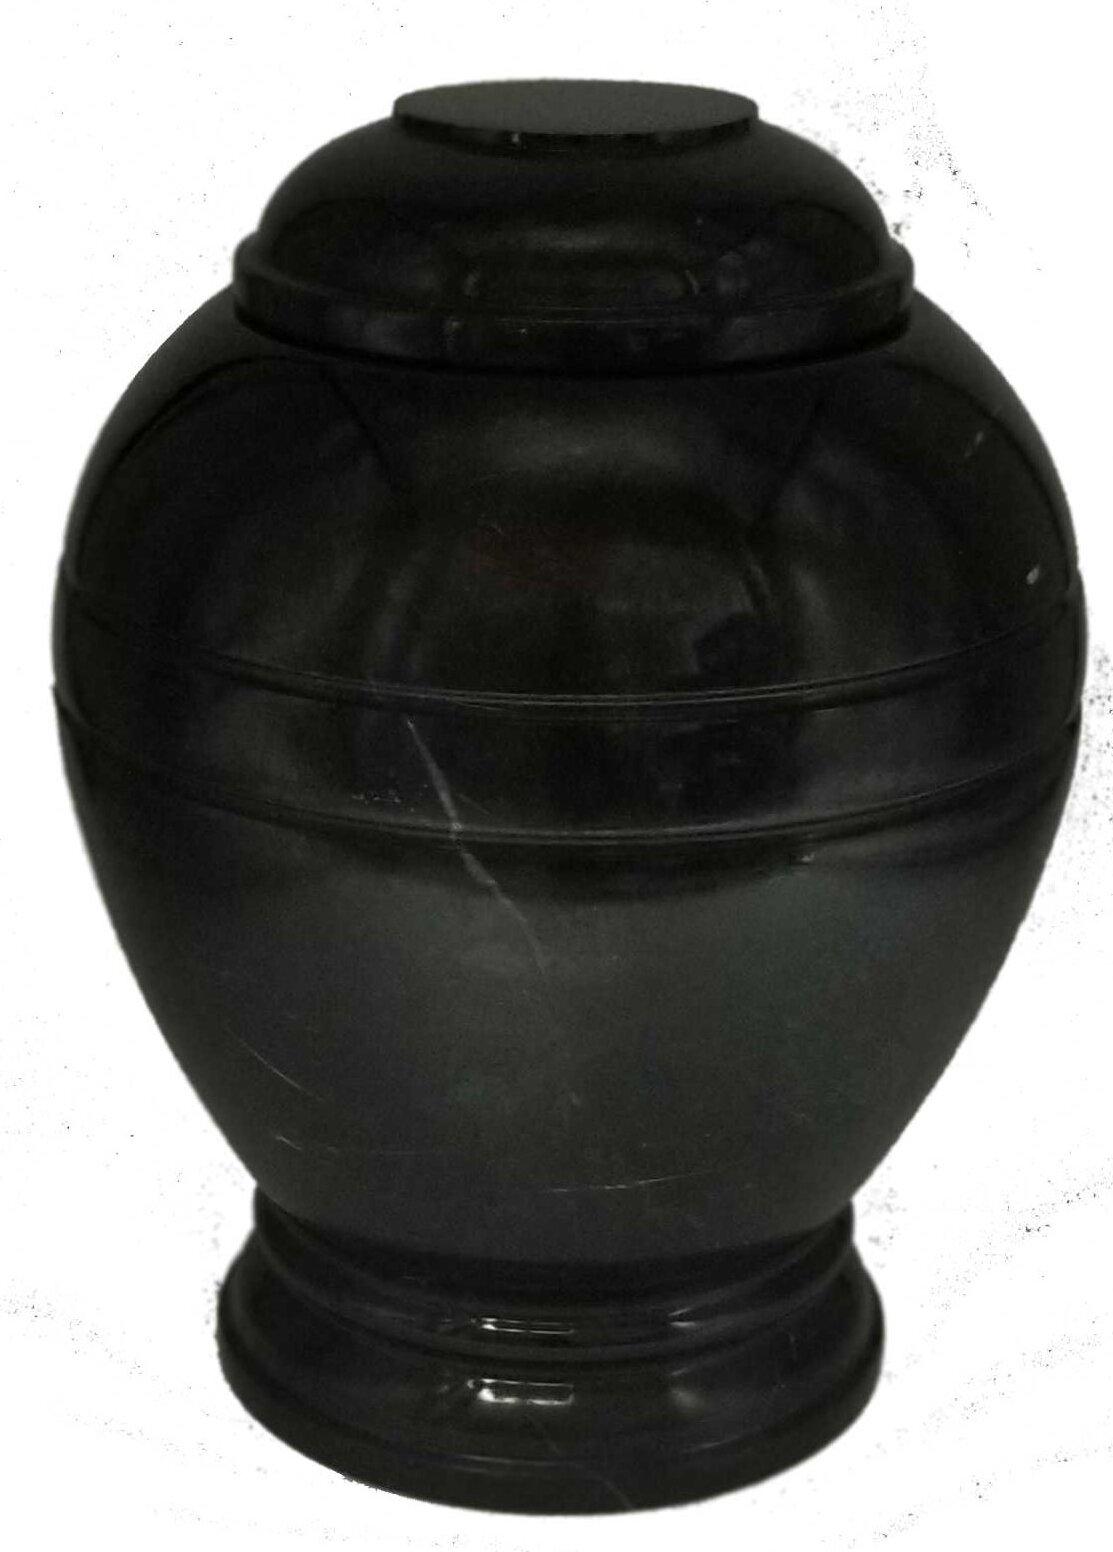 Black Fleur De Lis Living Vases Urns Jars Bottles You Ll Love In 2021 Wayfair